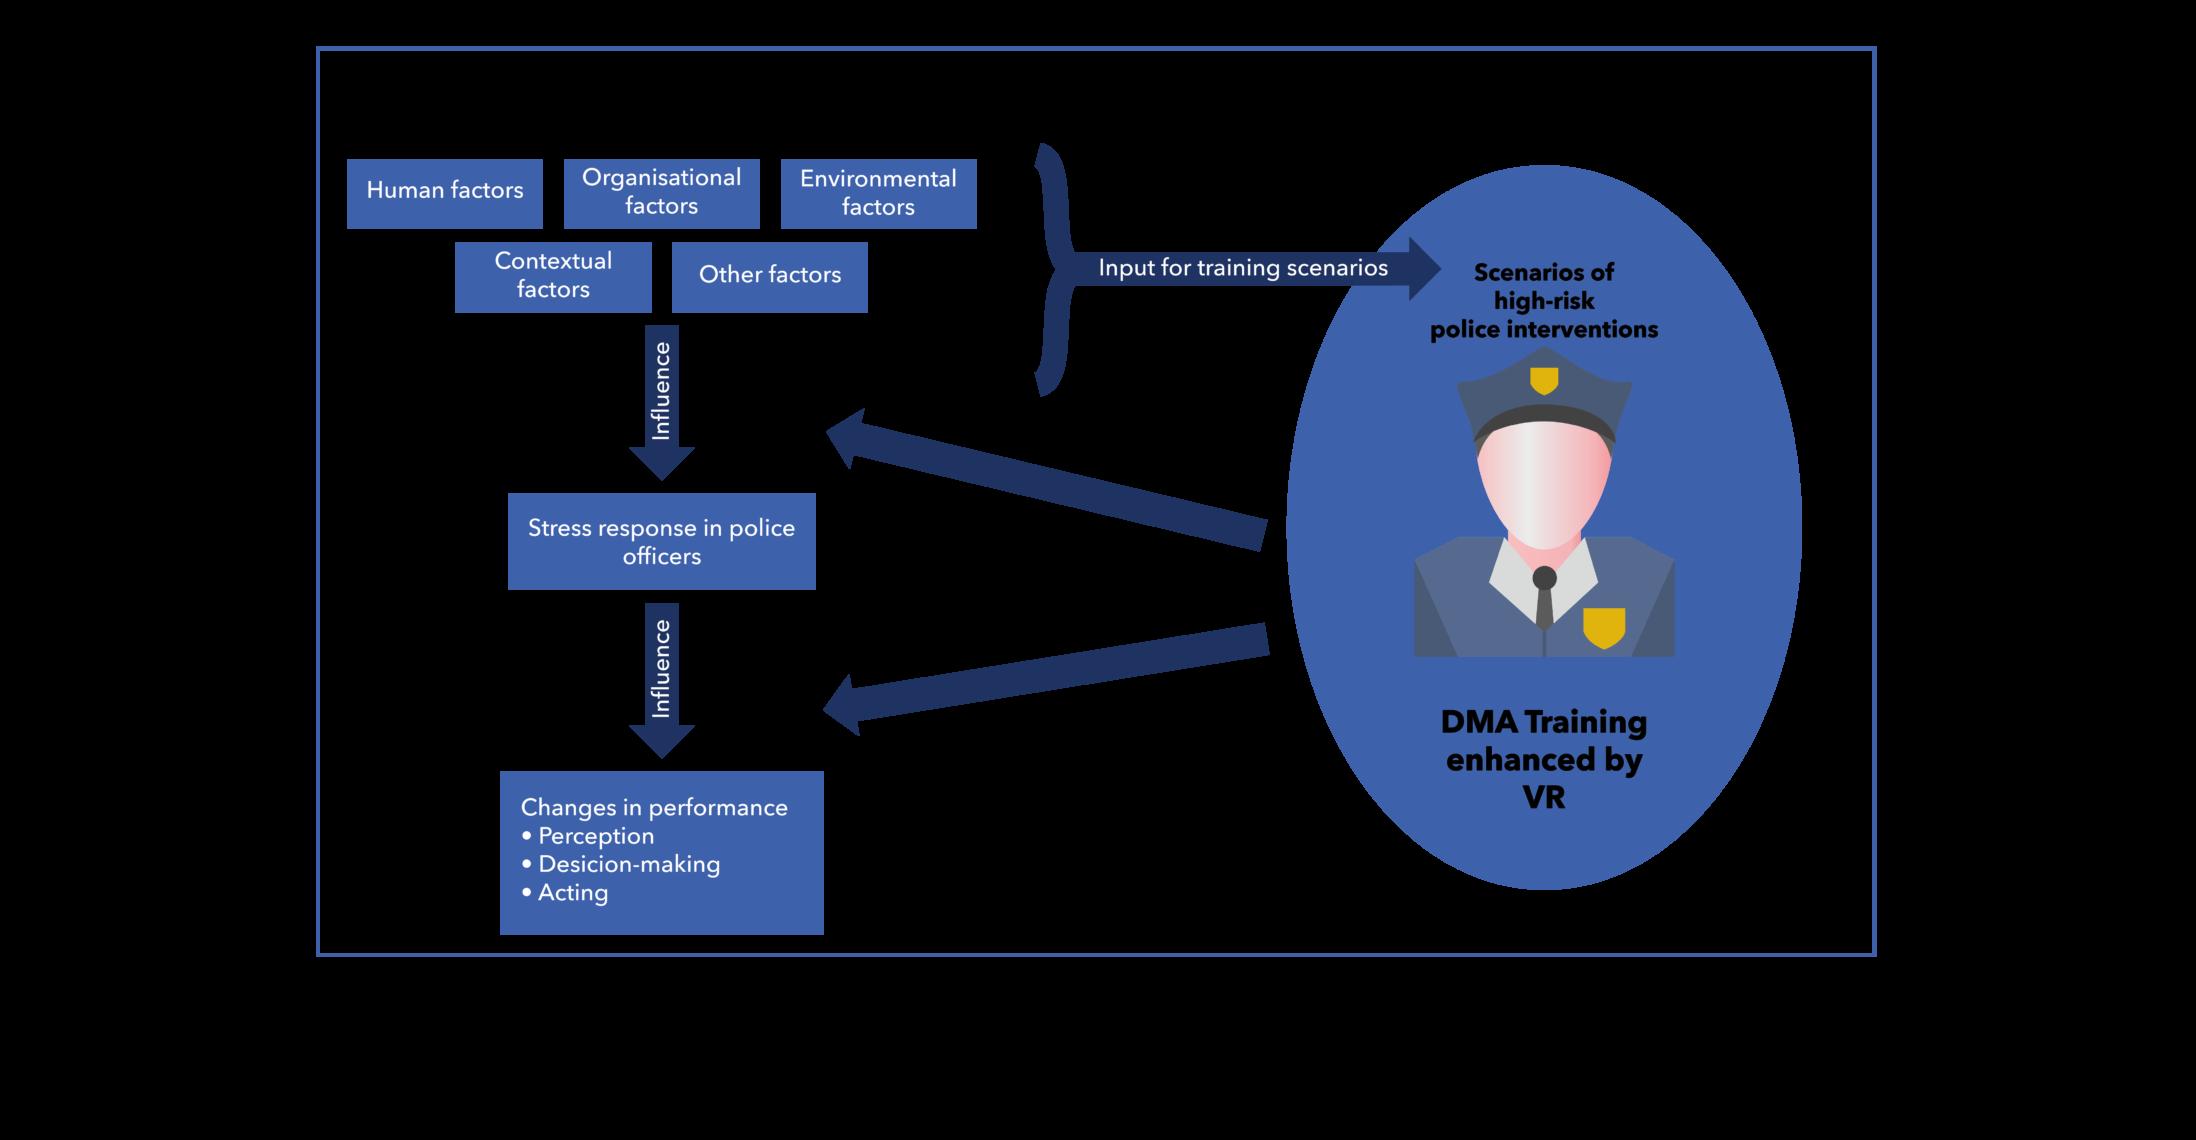 SHOTPROS - overview methodology of VR training